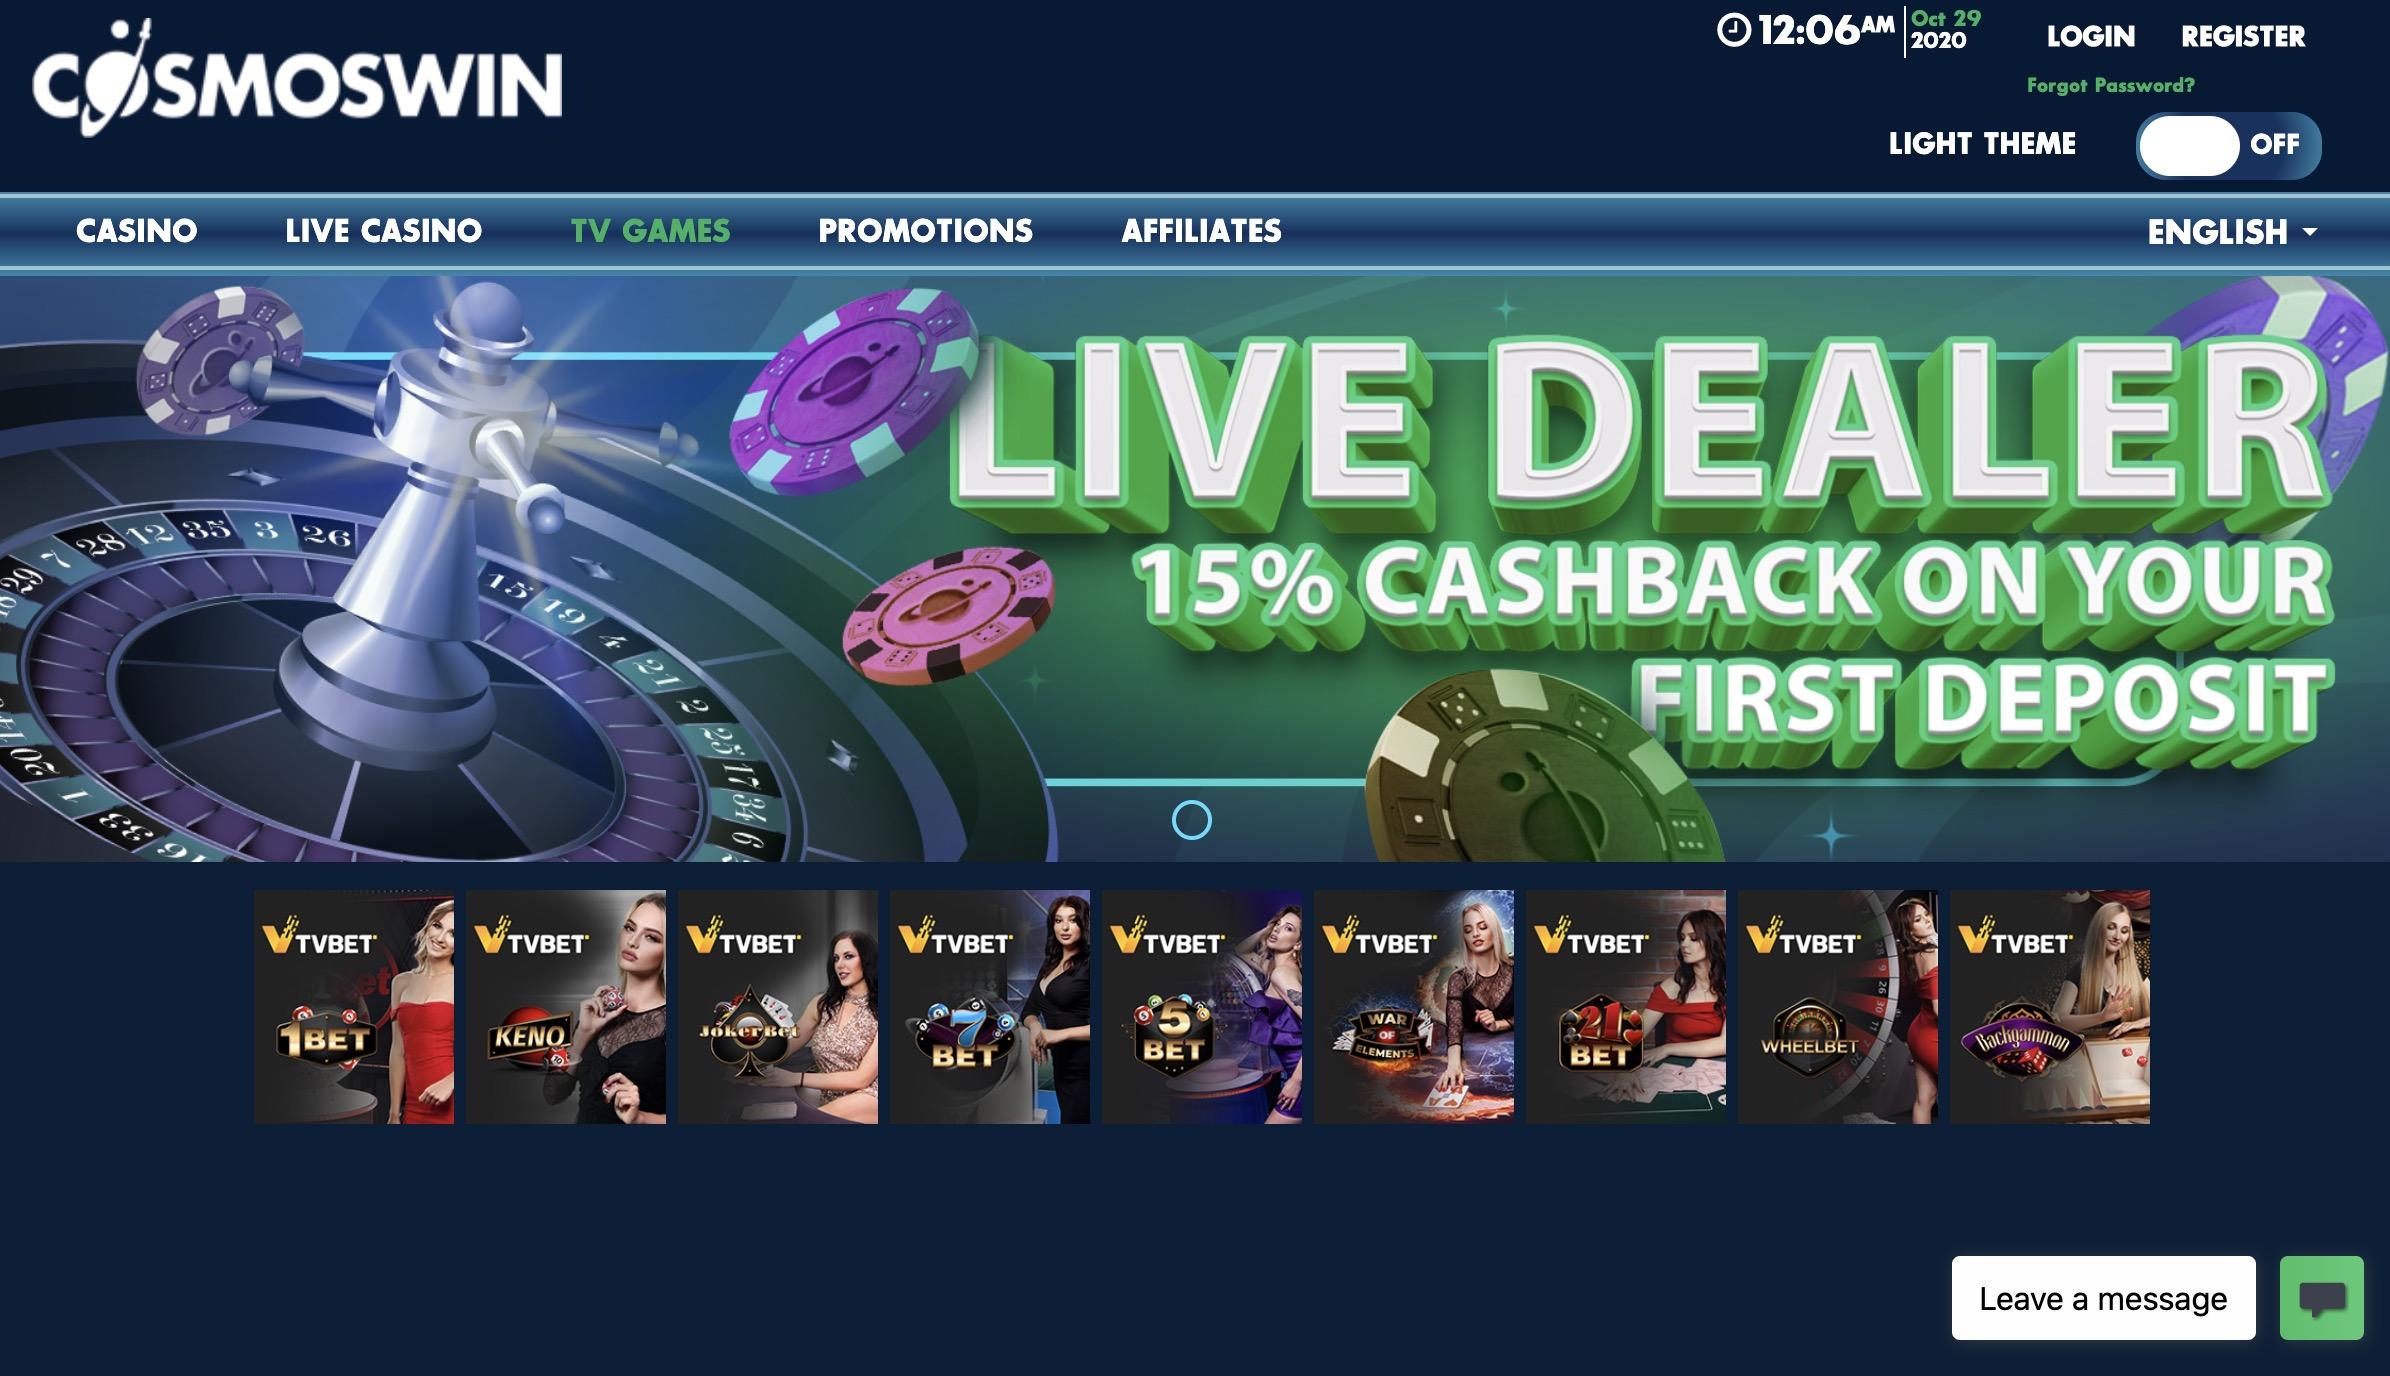 CosmosWins Casino Bonuses